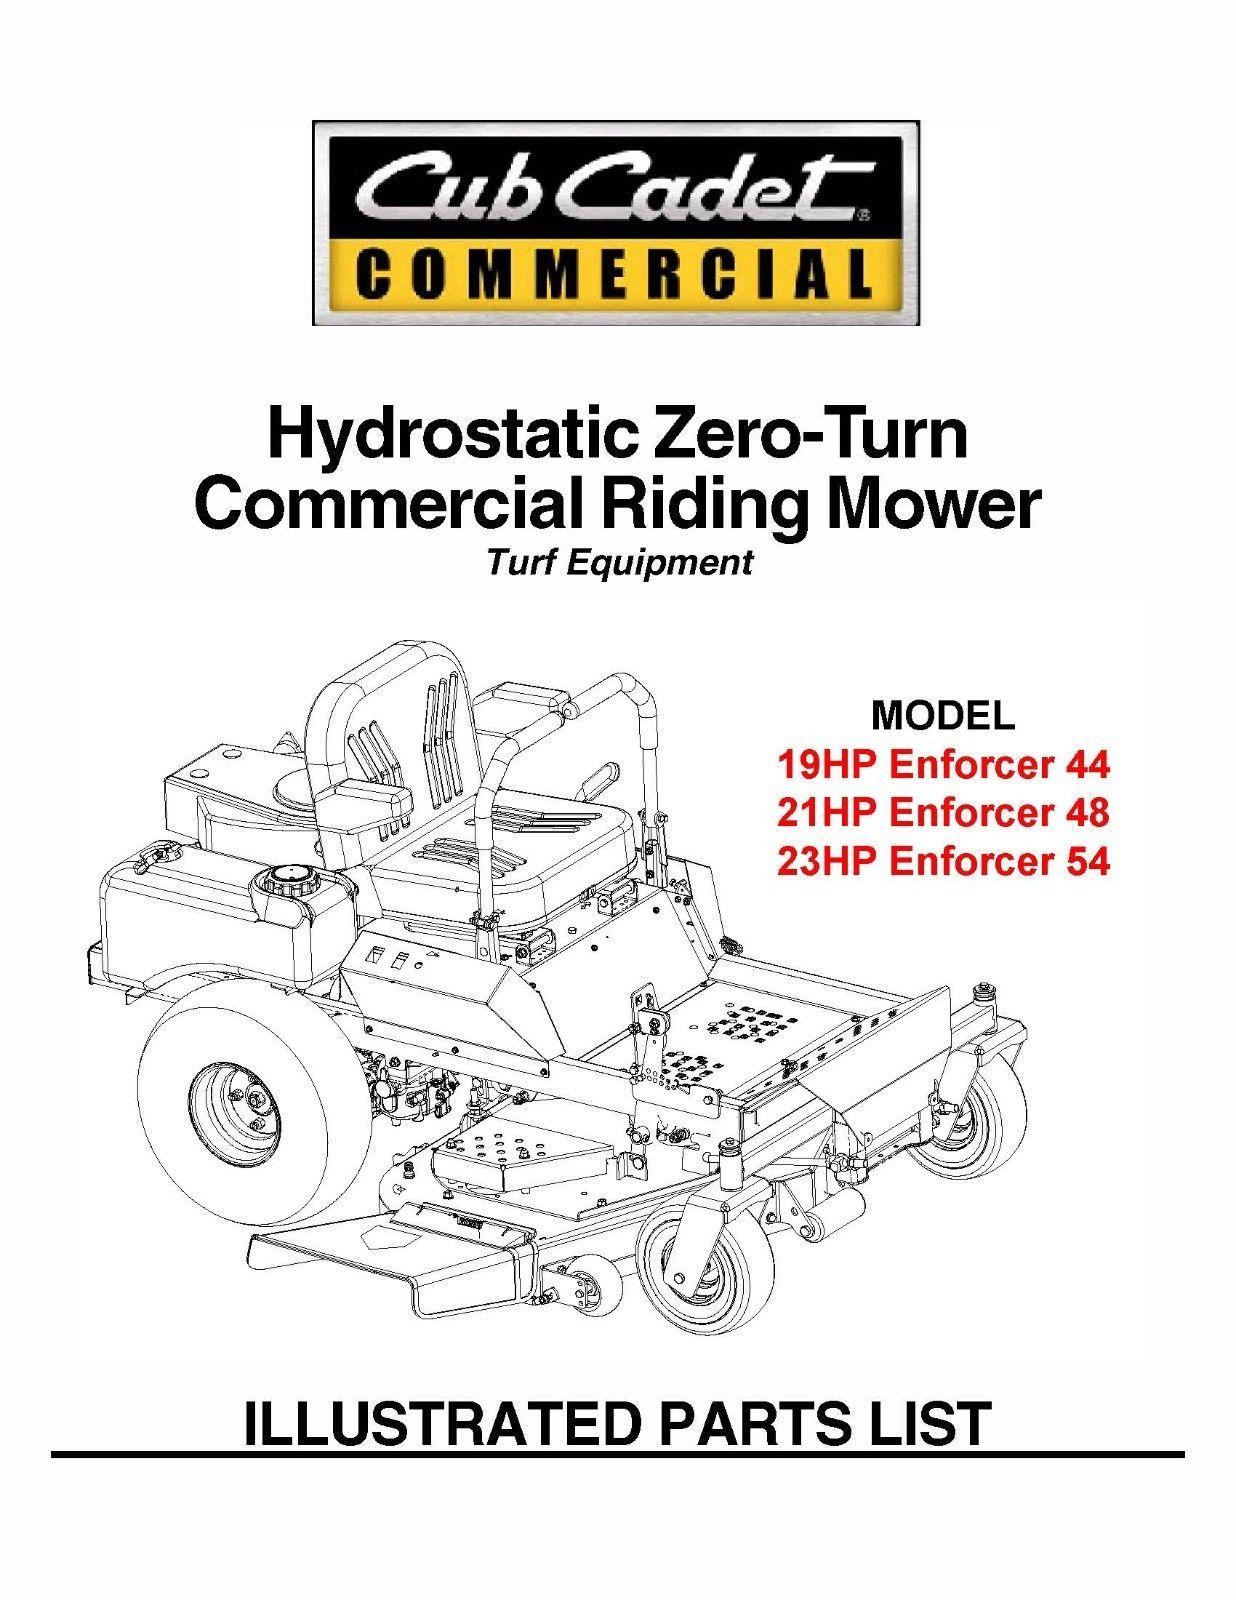 Cub Cadet Hydrostatic ZeroTurn Riding Mower Part Manual Model#.Enforcer 44 48 54